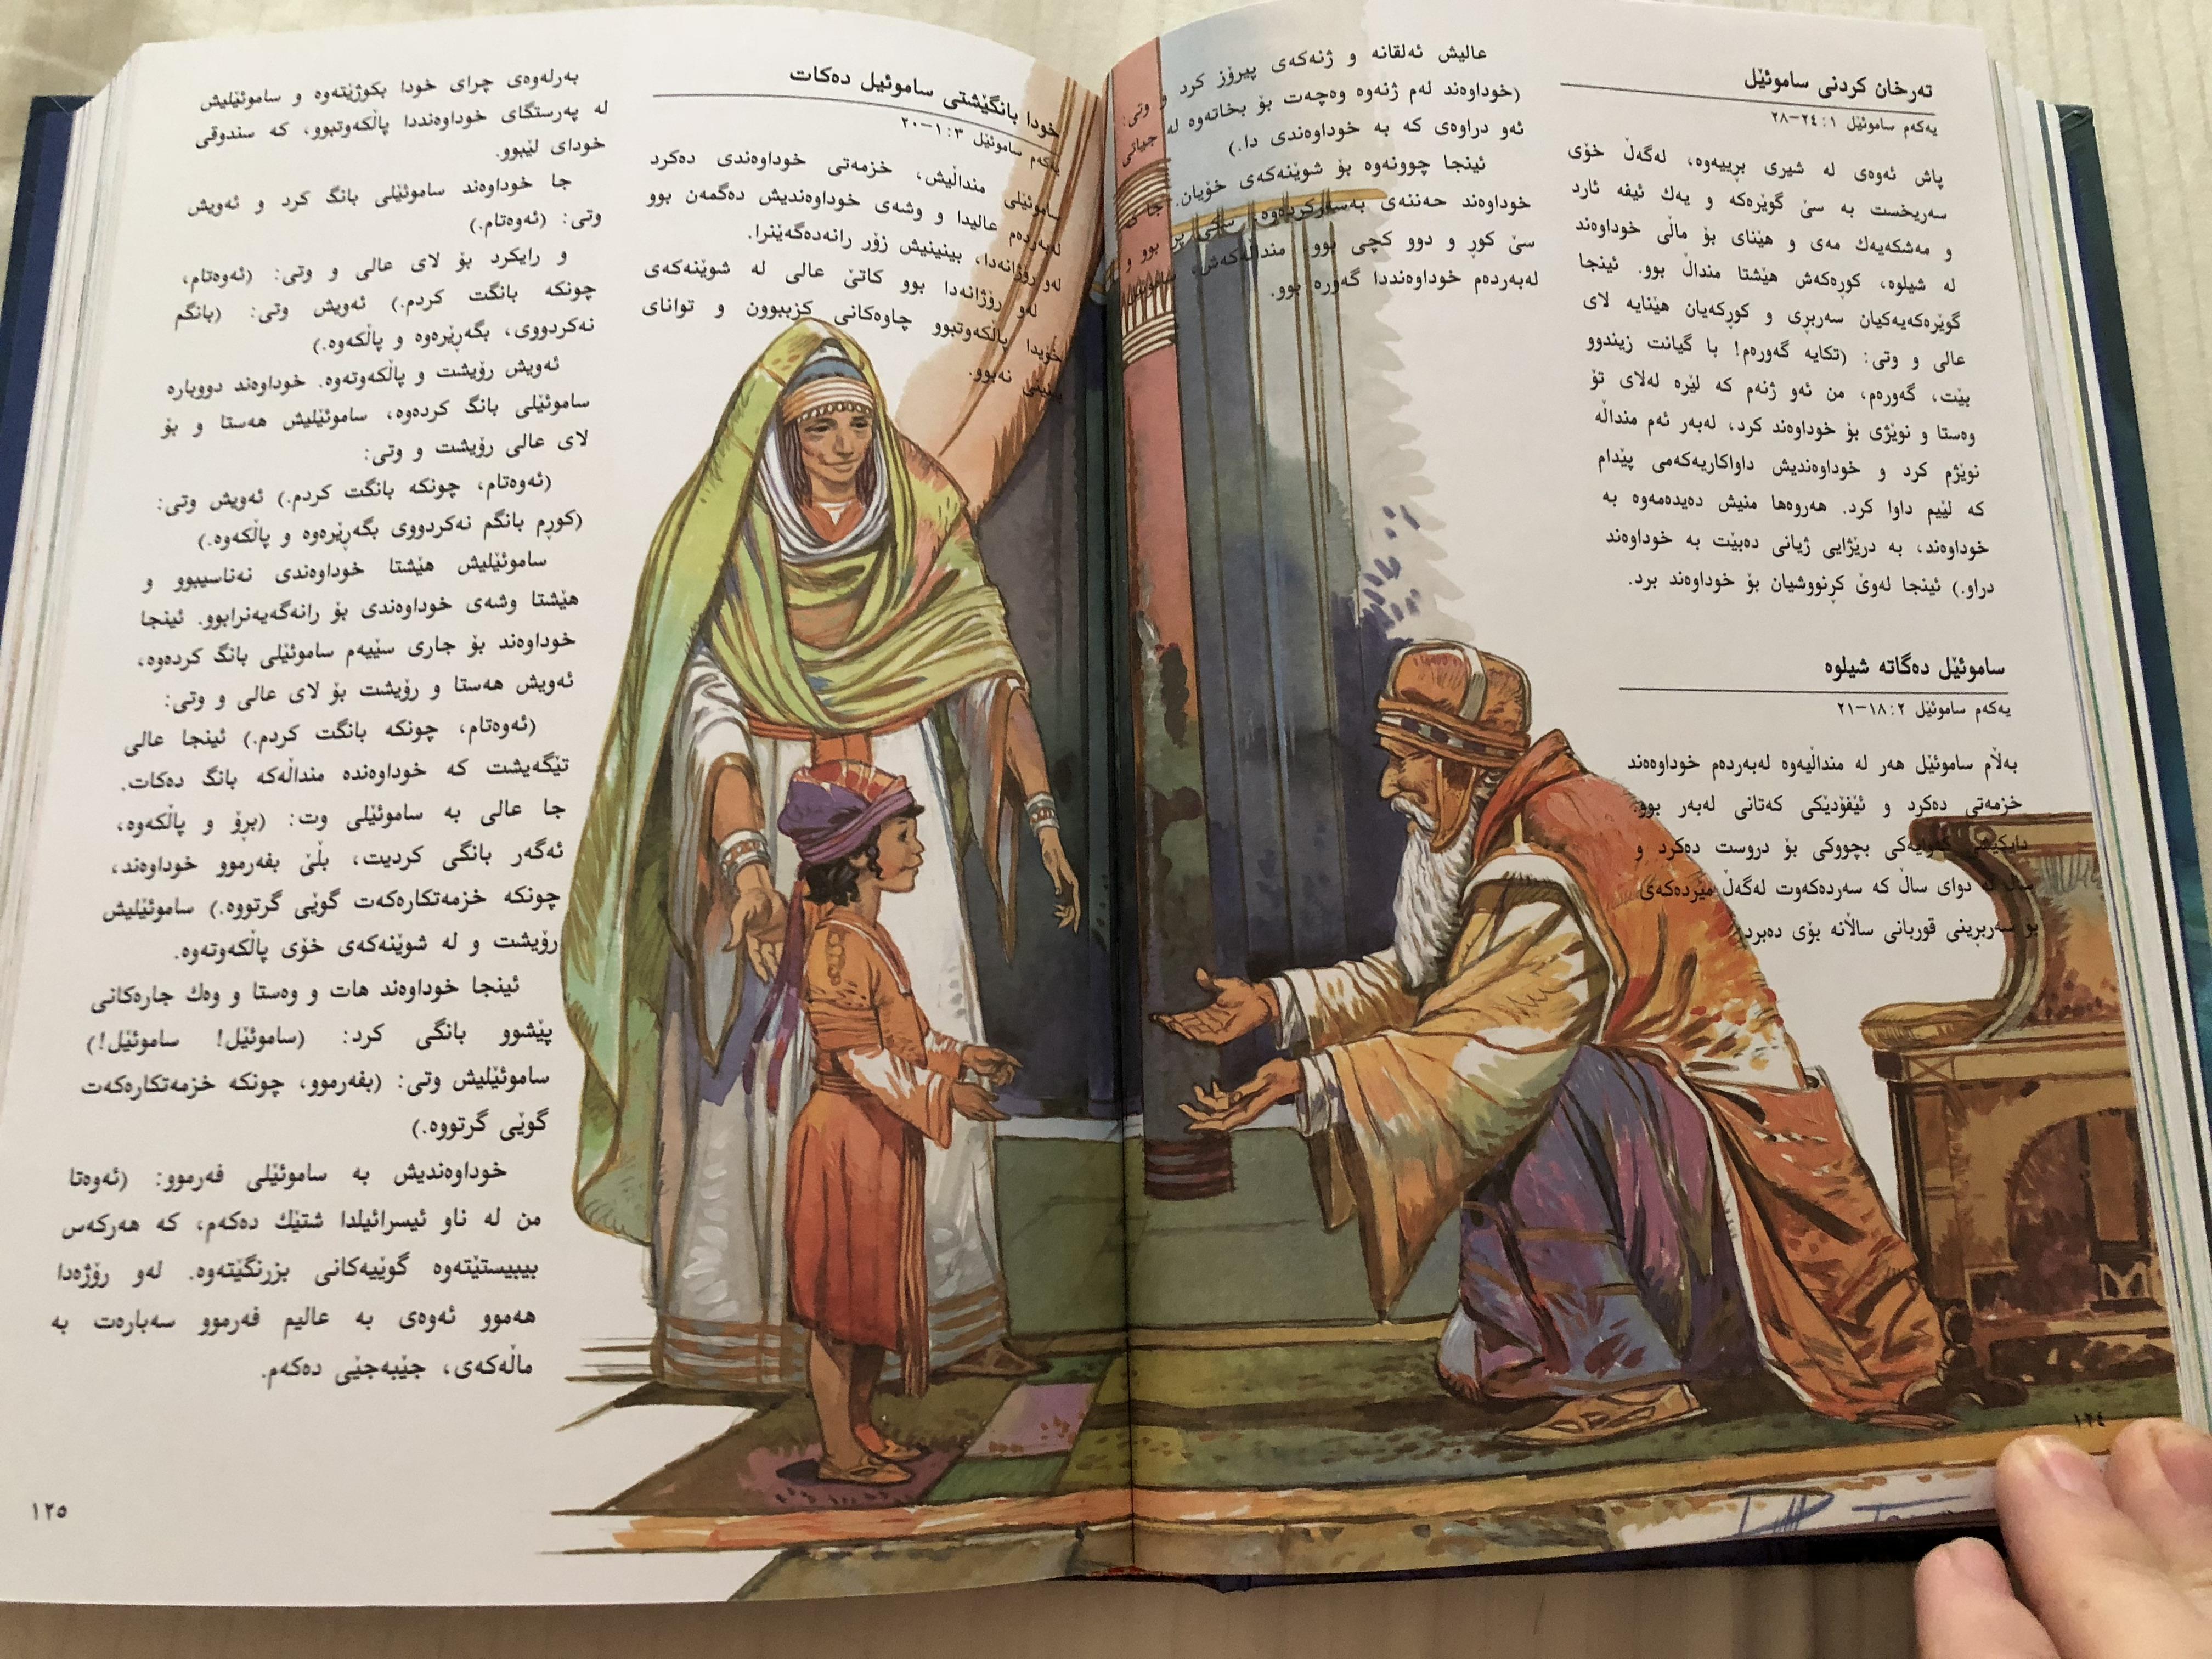 kurdish-children-s-bible-7-.jpg